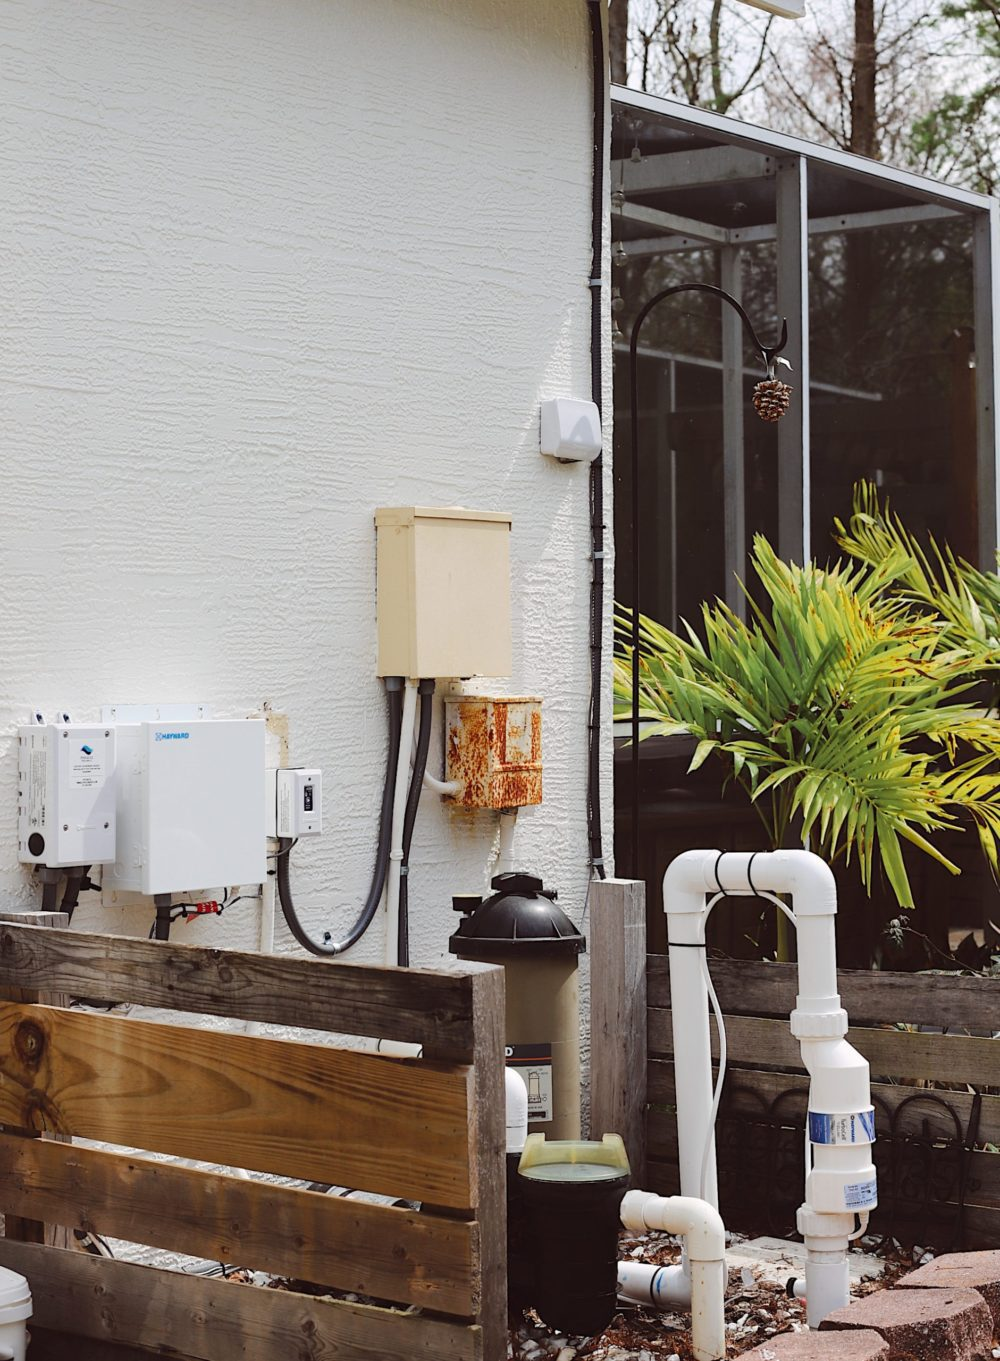 Salt water pool conversion guide featured by top Florida home blog, Fresh Mommy Blog. Hayward AquaRite 900 review | Hayward Aqua Rite Salt Chlorine Generator by popular Florida lifestyle blog, Fresh Mommy Blog: image of a Hayward Aqua Rite Salt Chlorine Generator.